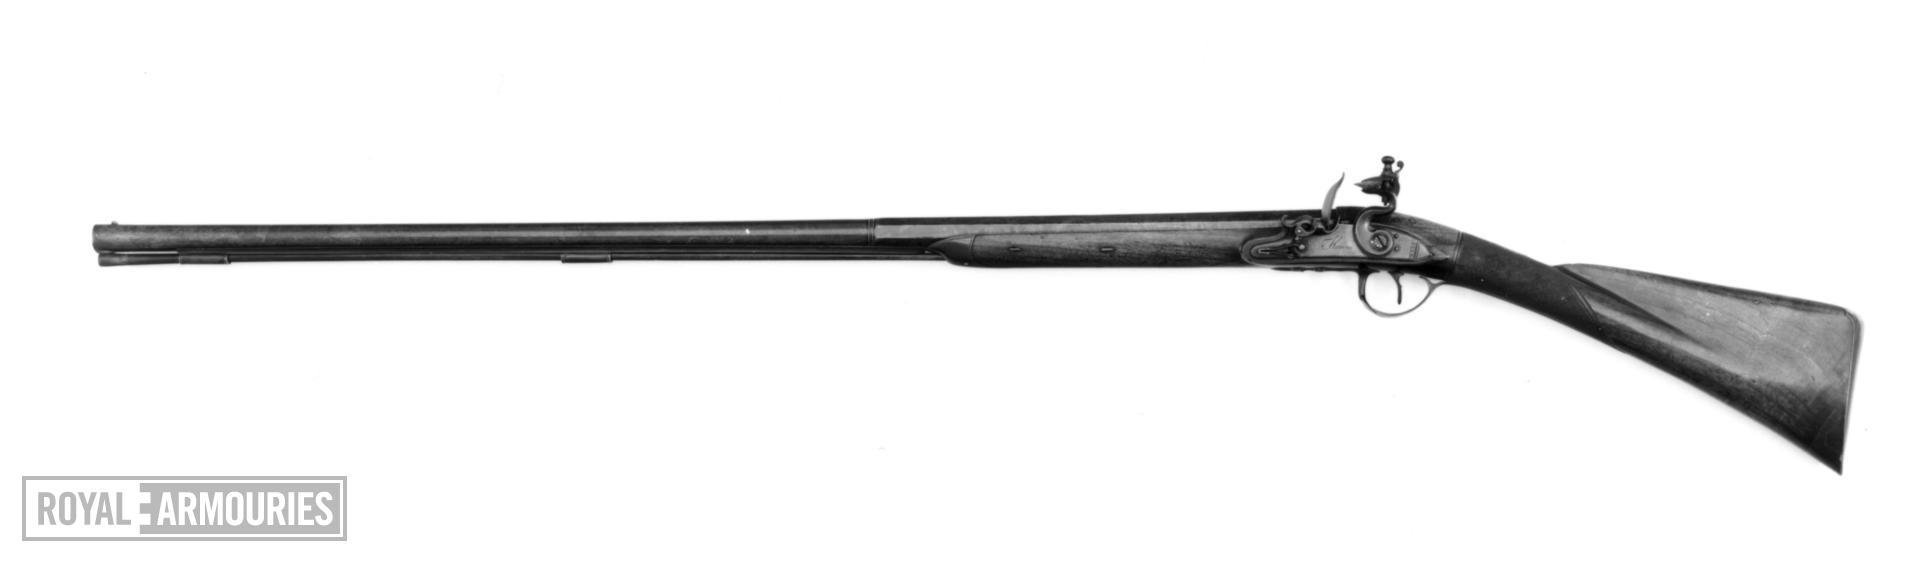 Flintlock gun - By Thomas